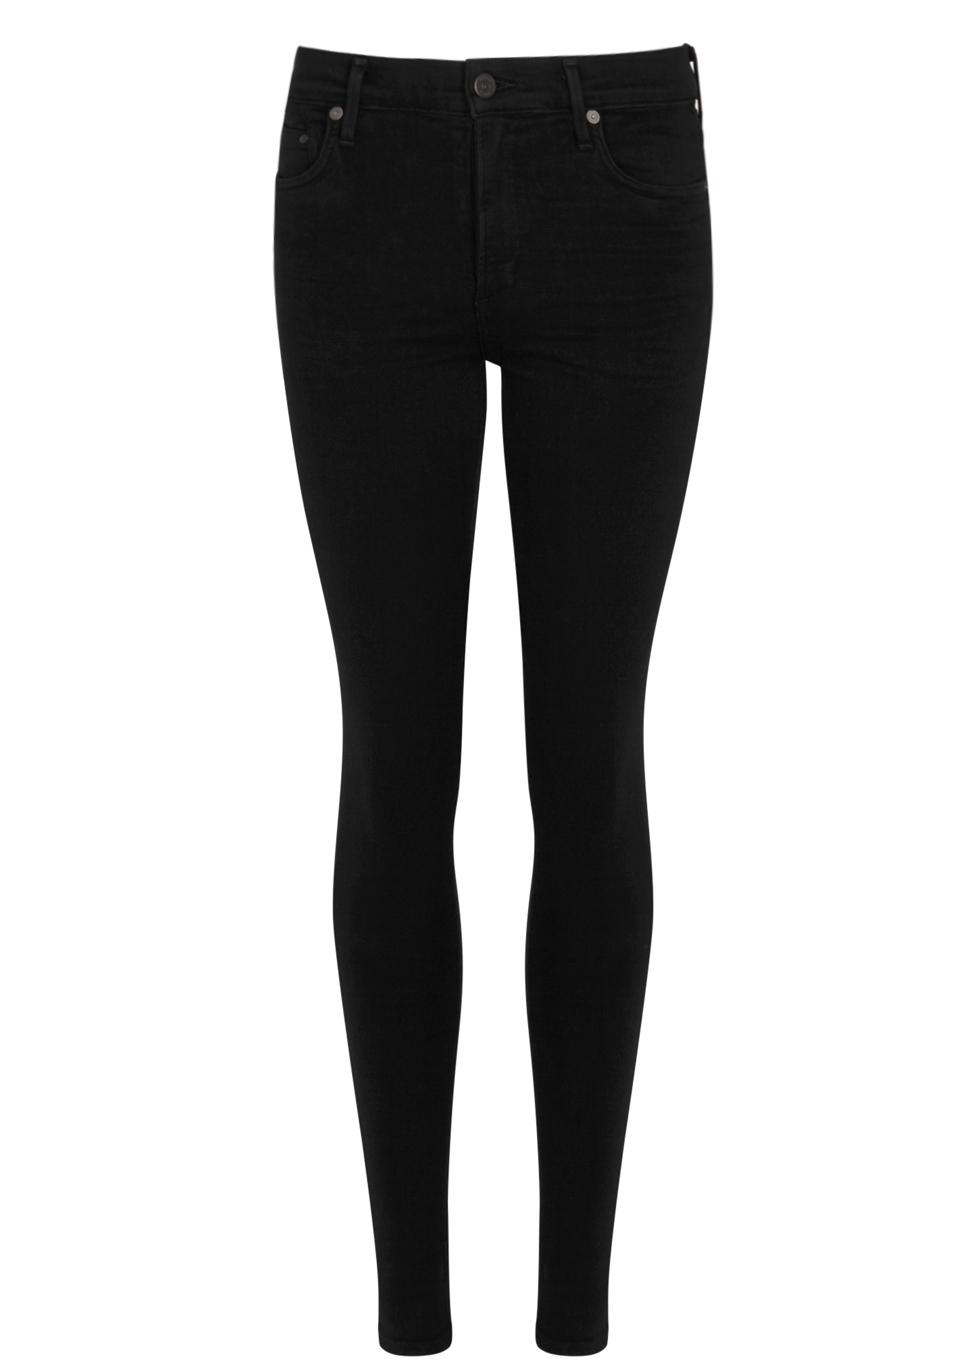 Rocket black skinny jeans